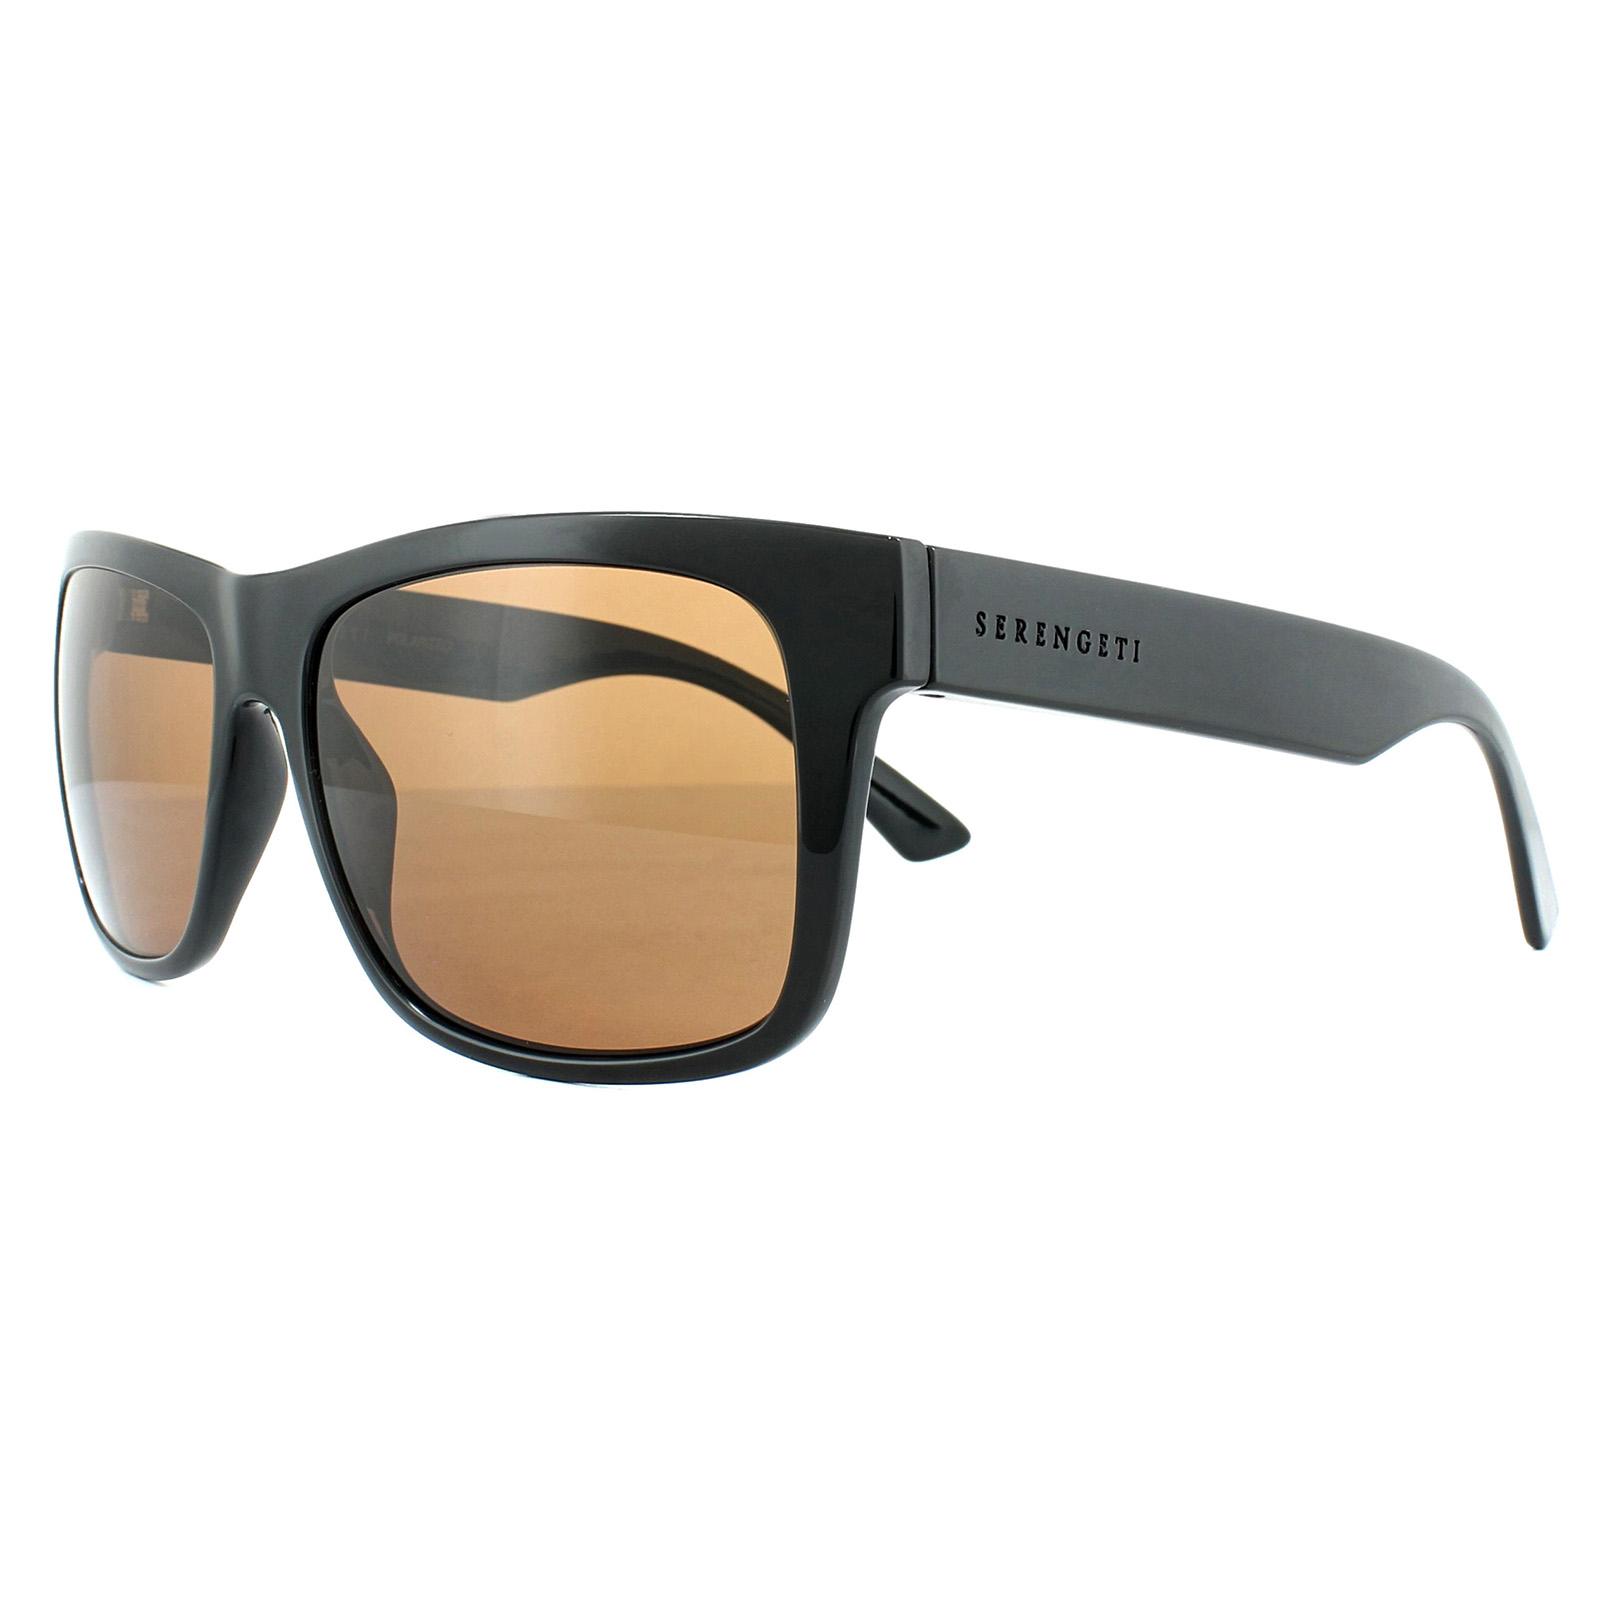 d77f36e448f Sentinel Serengeti Sunglasses Positano 8369 Shiny Black Drivers Brown  Polarized